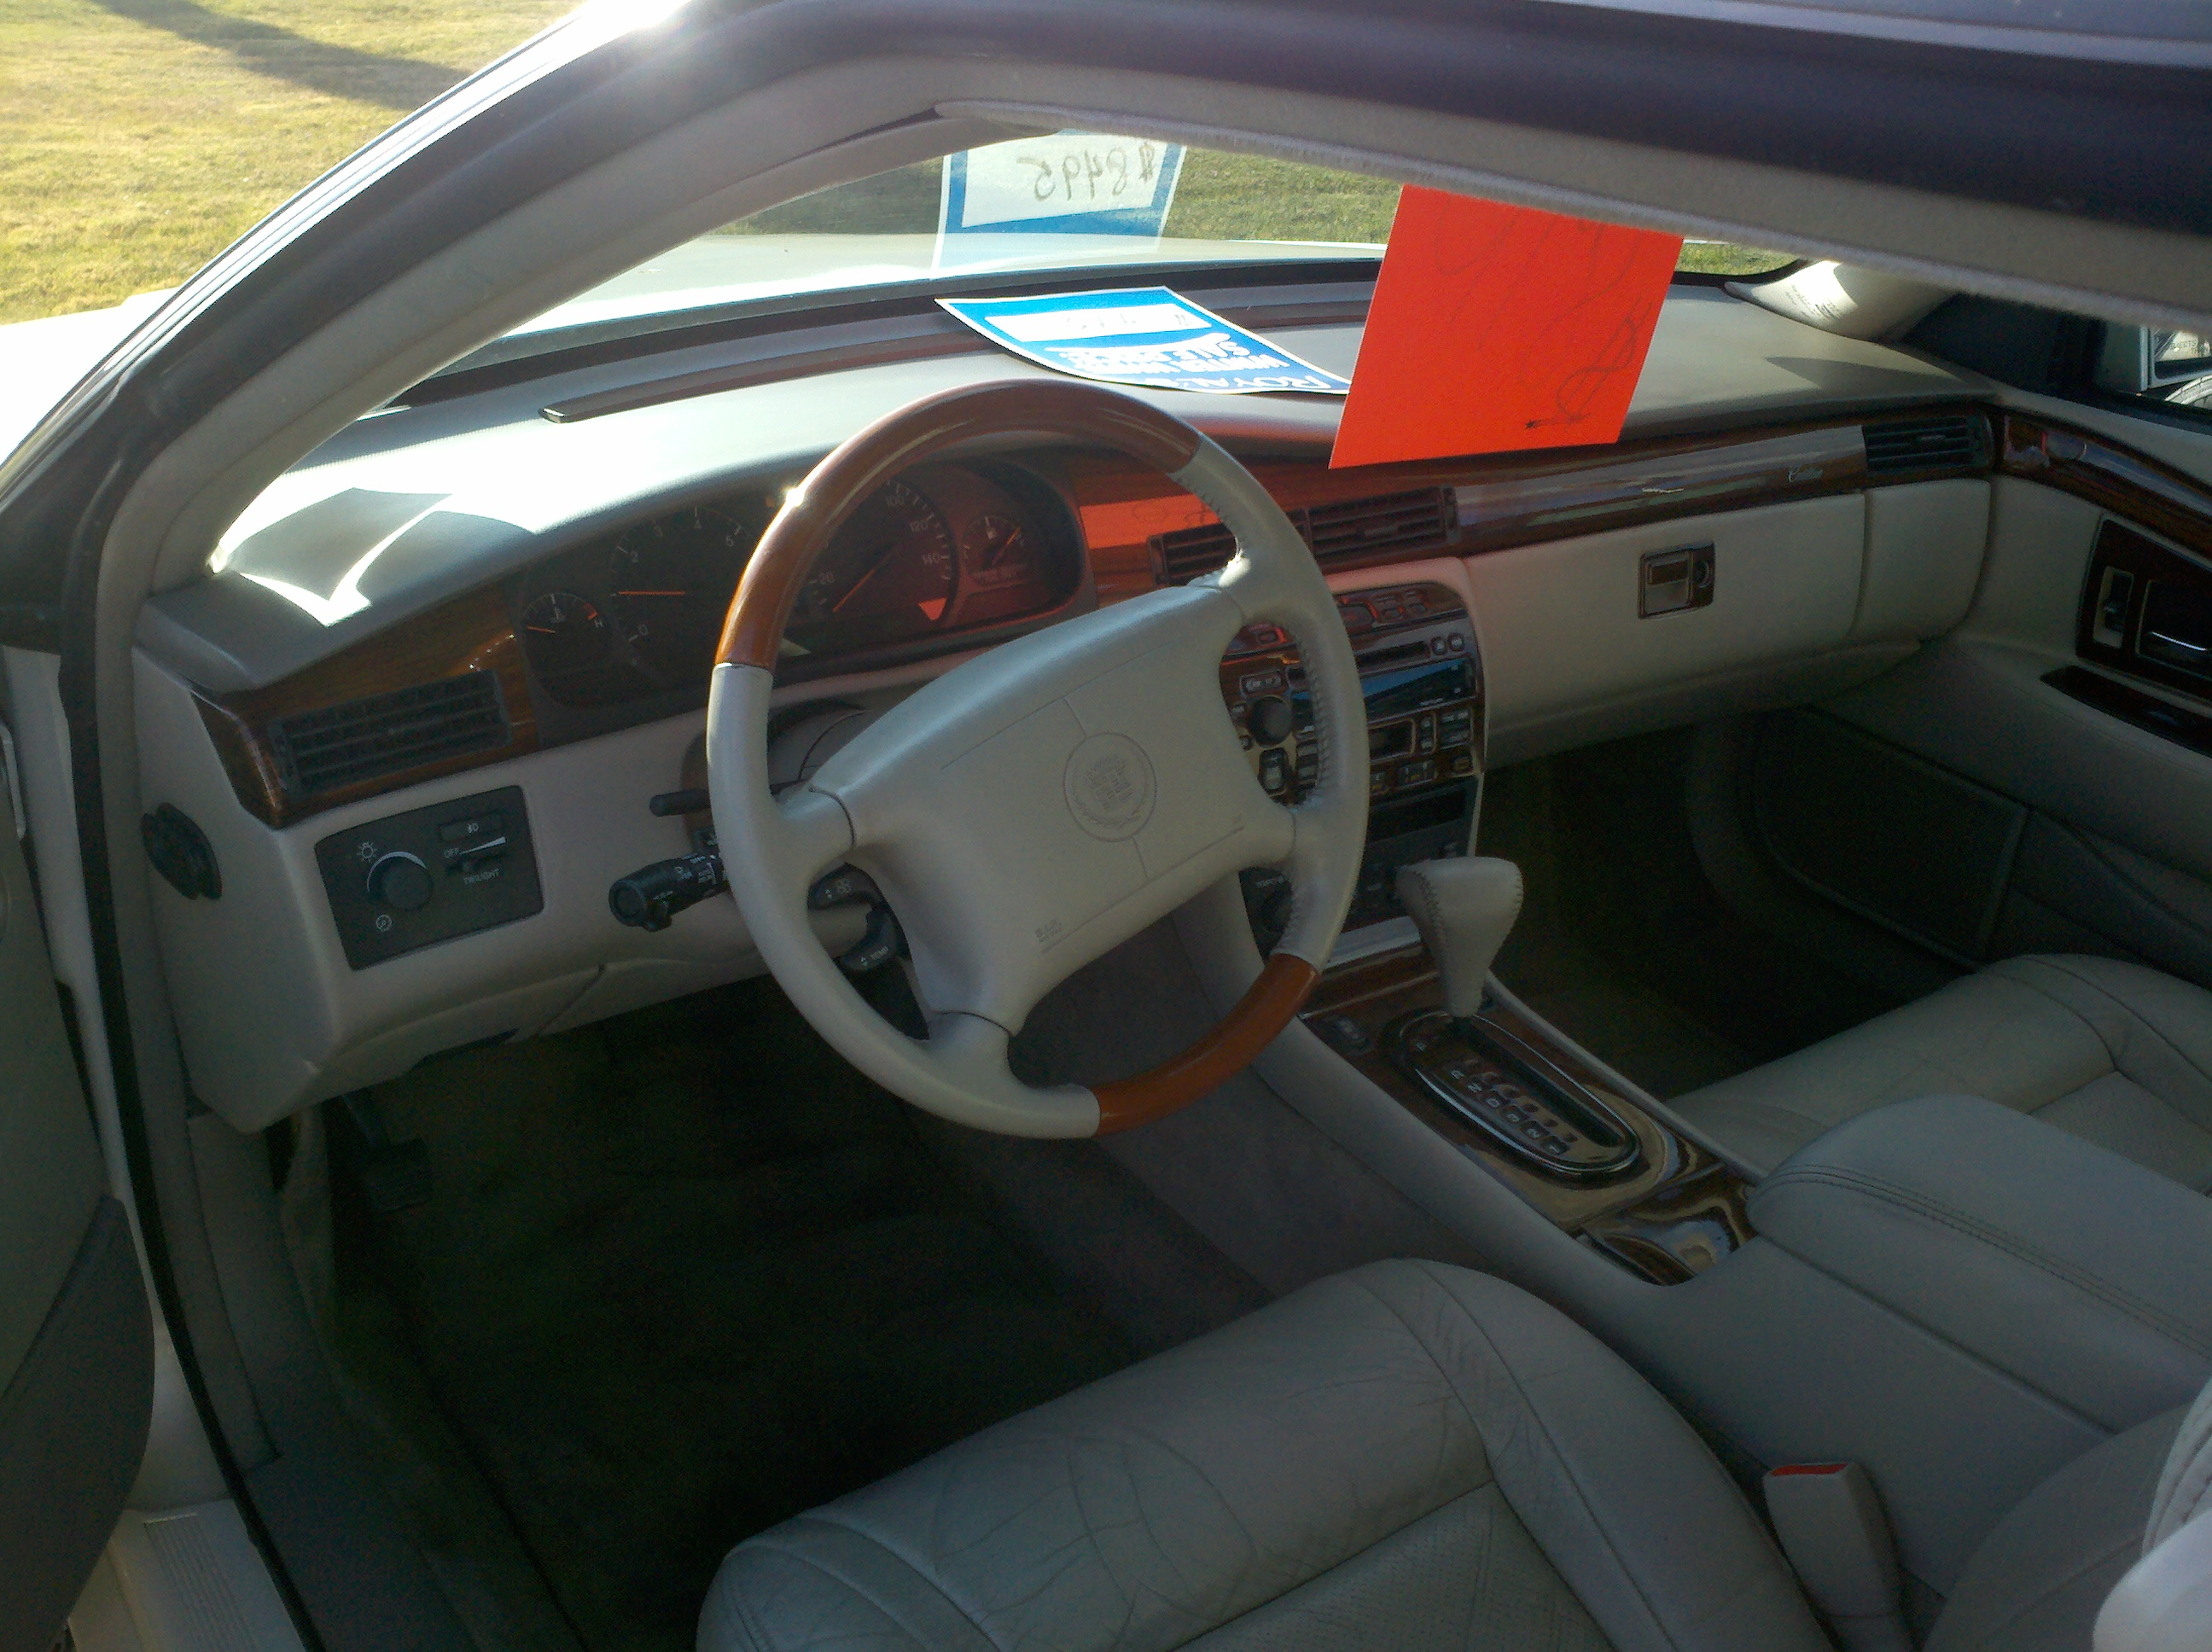 Test Driven: 2000 Cadillac Eldorado ETC | Mind Over Motor